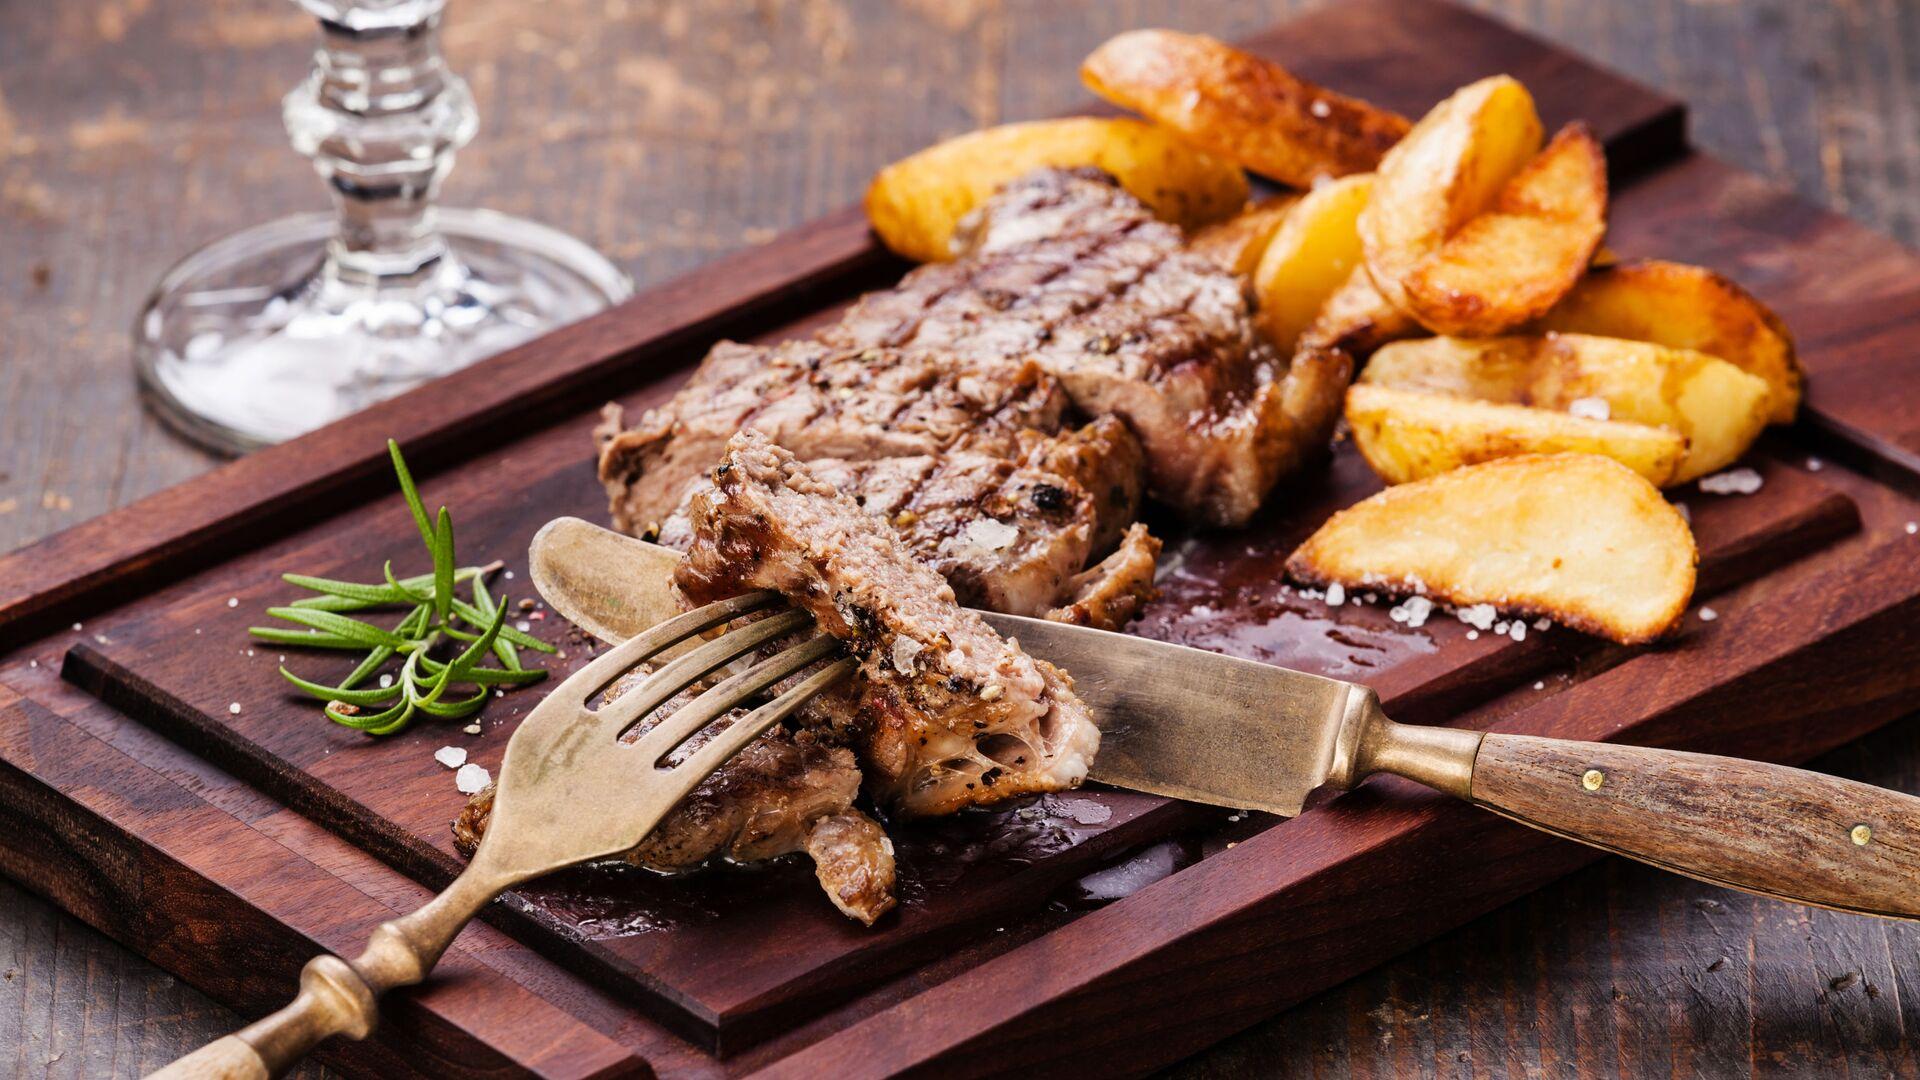 Steak s bramborem - Sputnik Česká republika, 1920, 03.06.2021